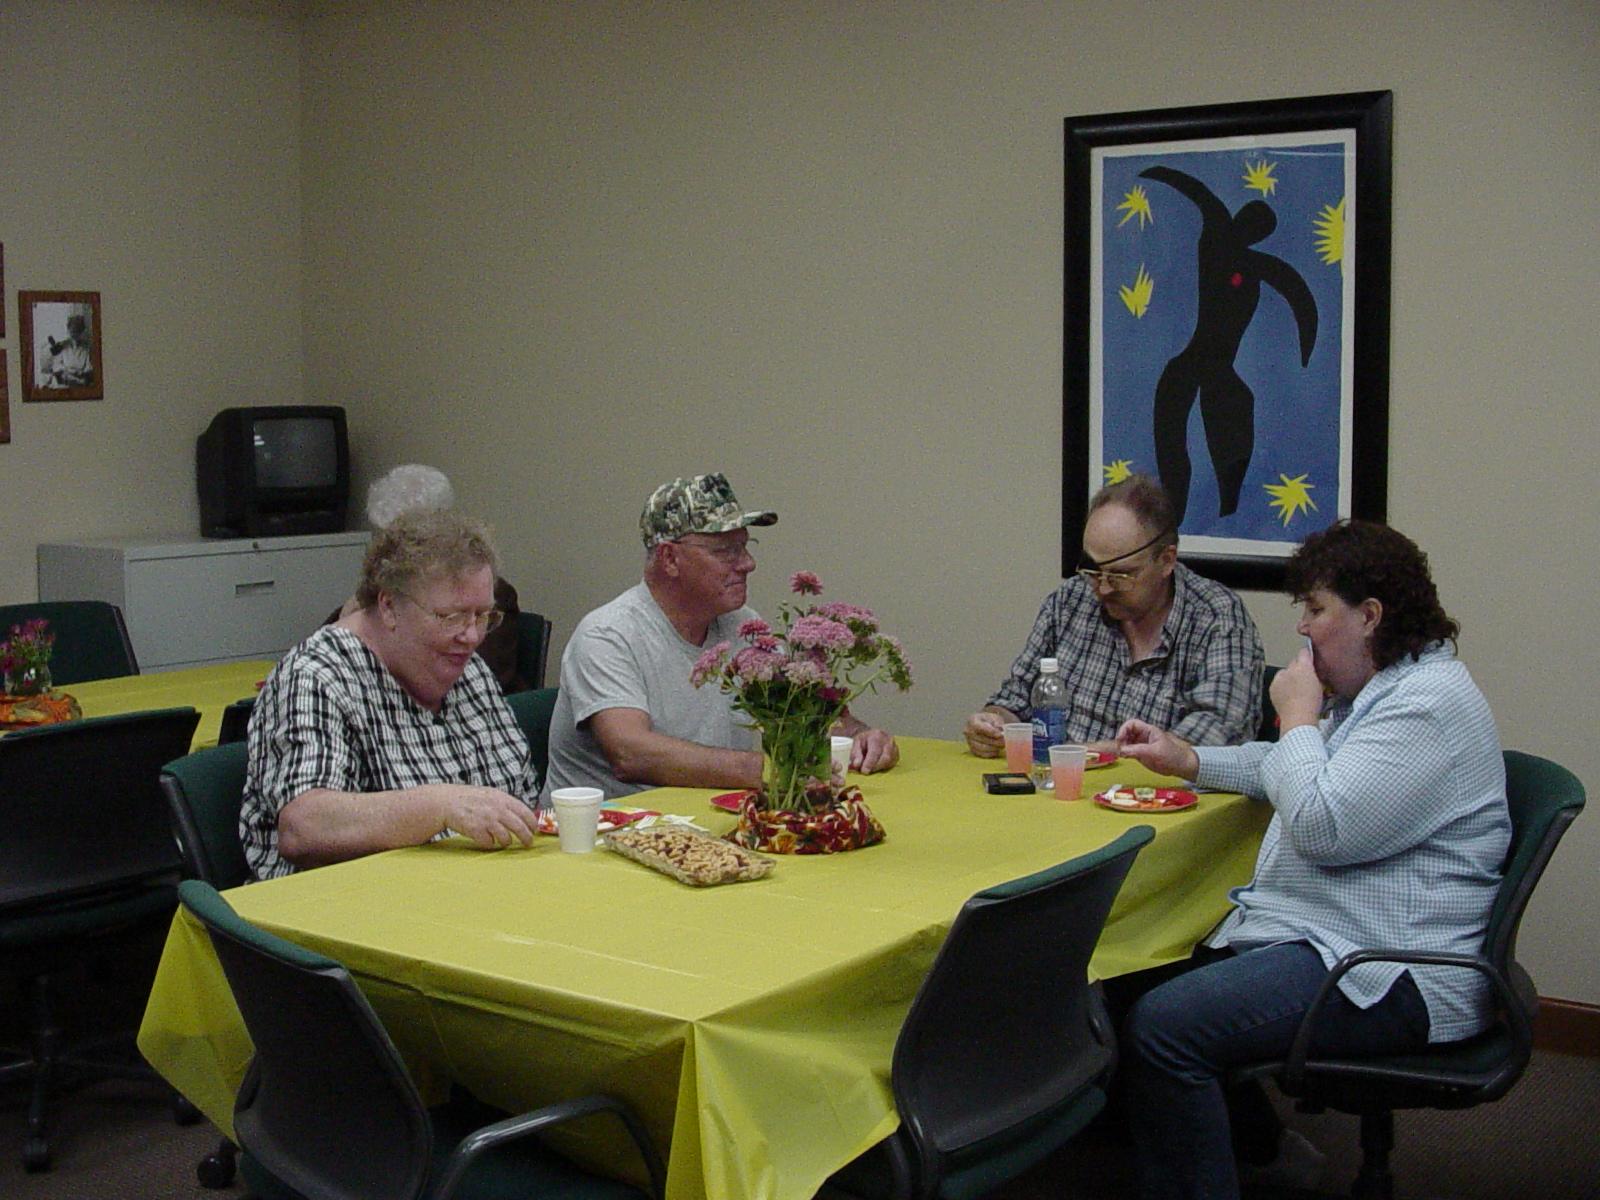 Group of volunteers enjoy a meal together